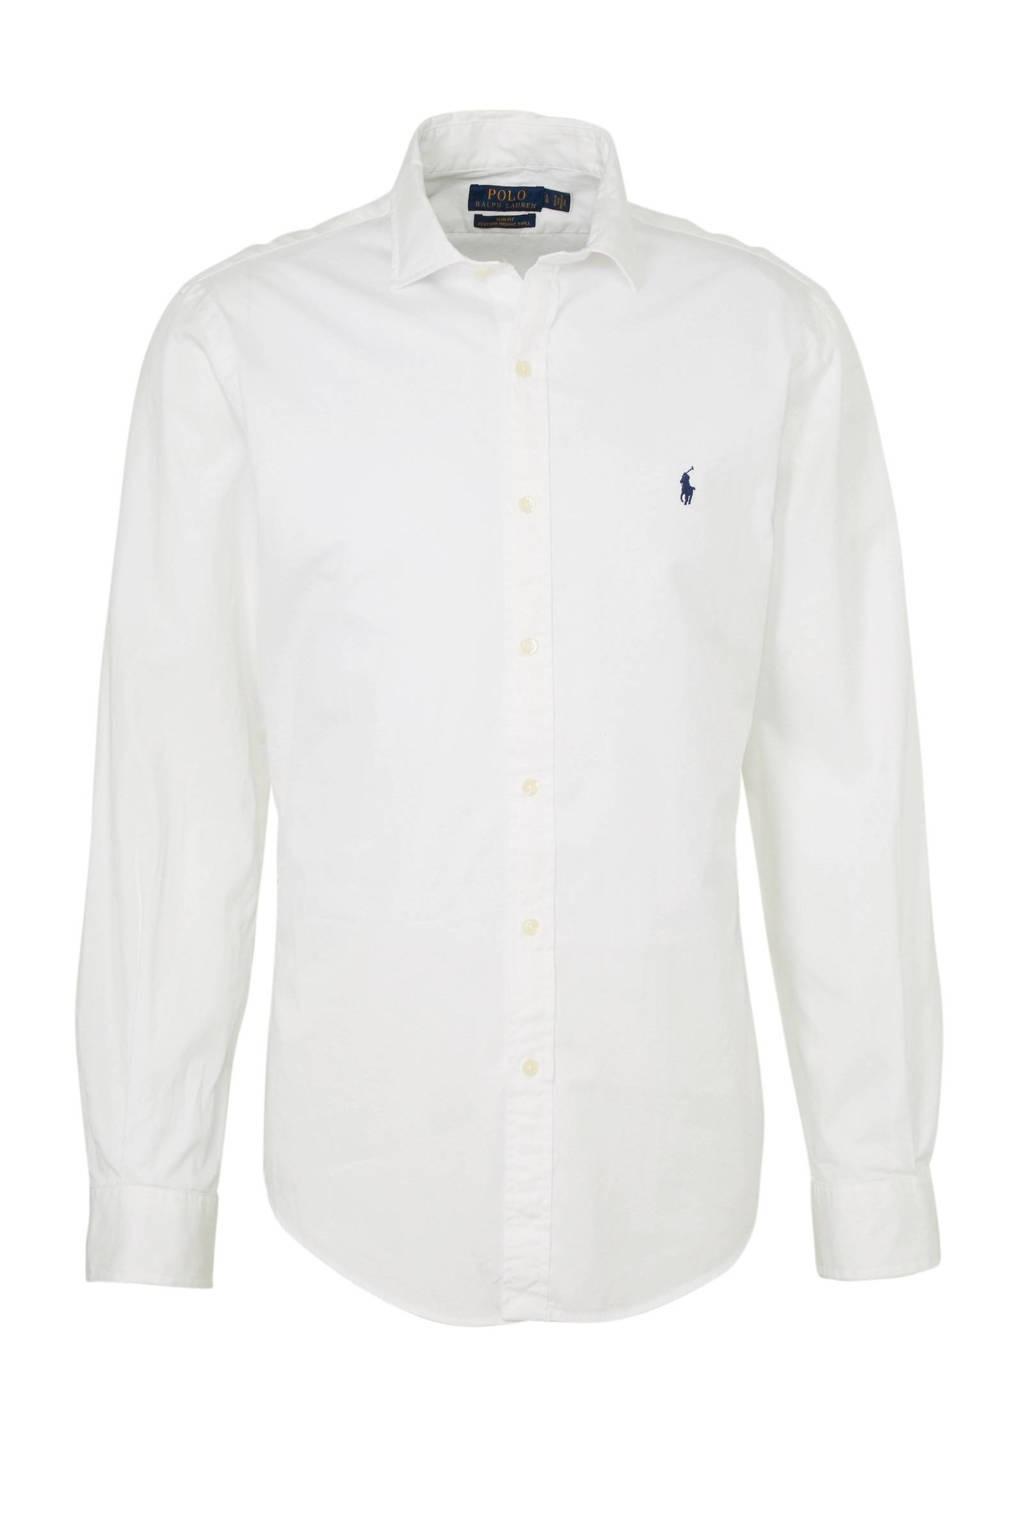 Shirt-1